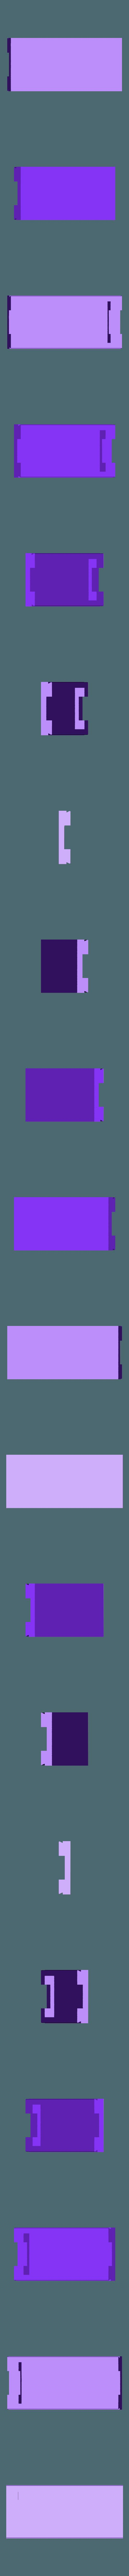 Led1.stl Download free STL file WS2812 led shade • 3D print design, DK7